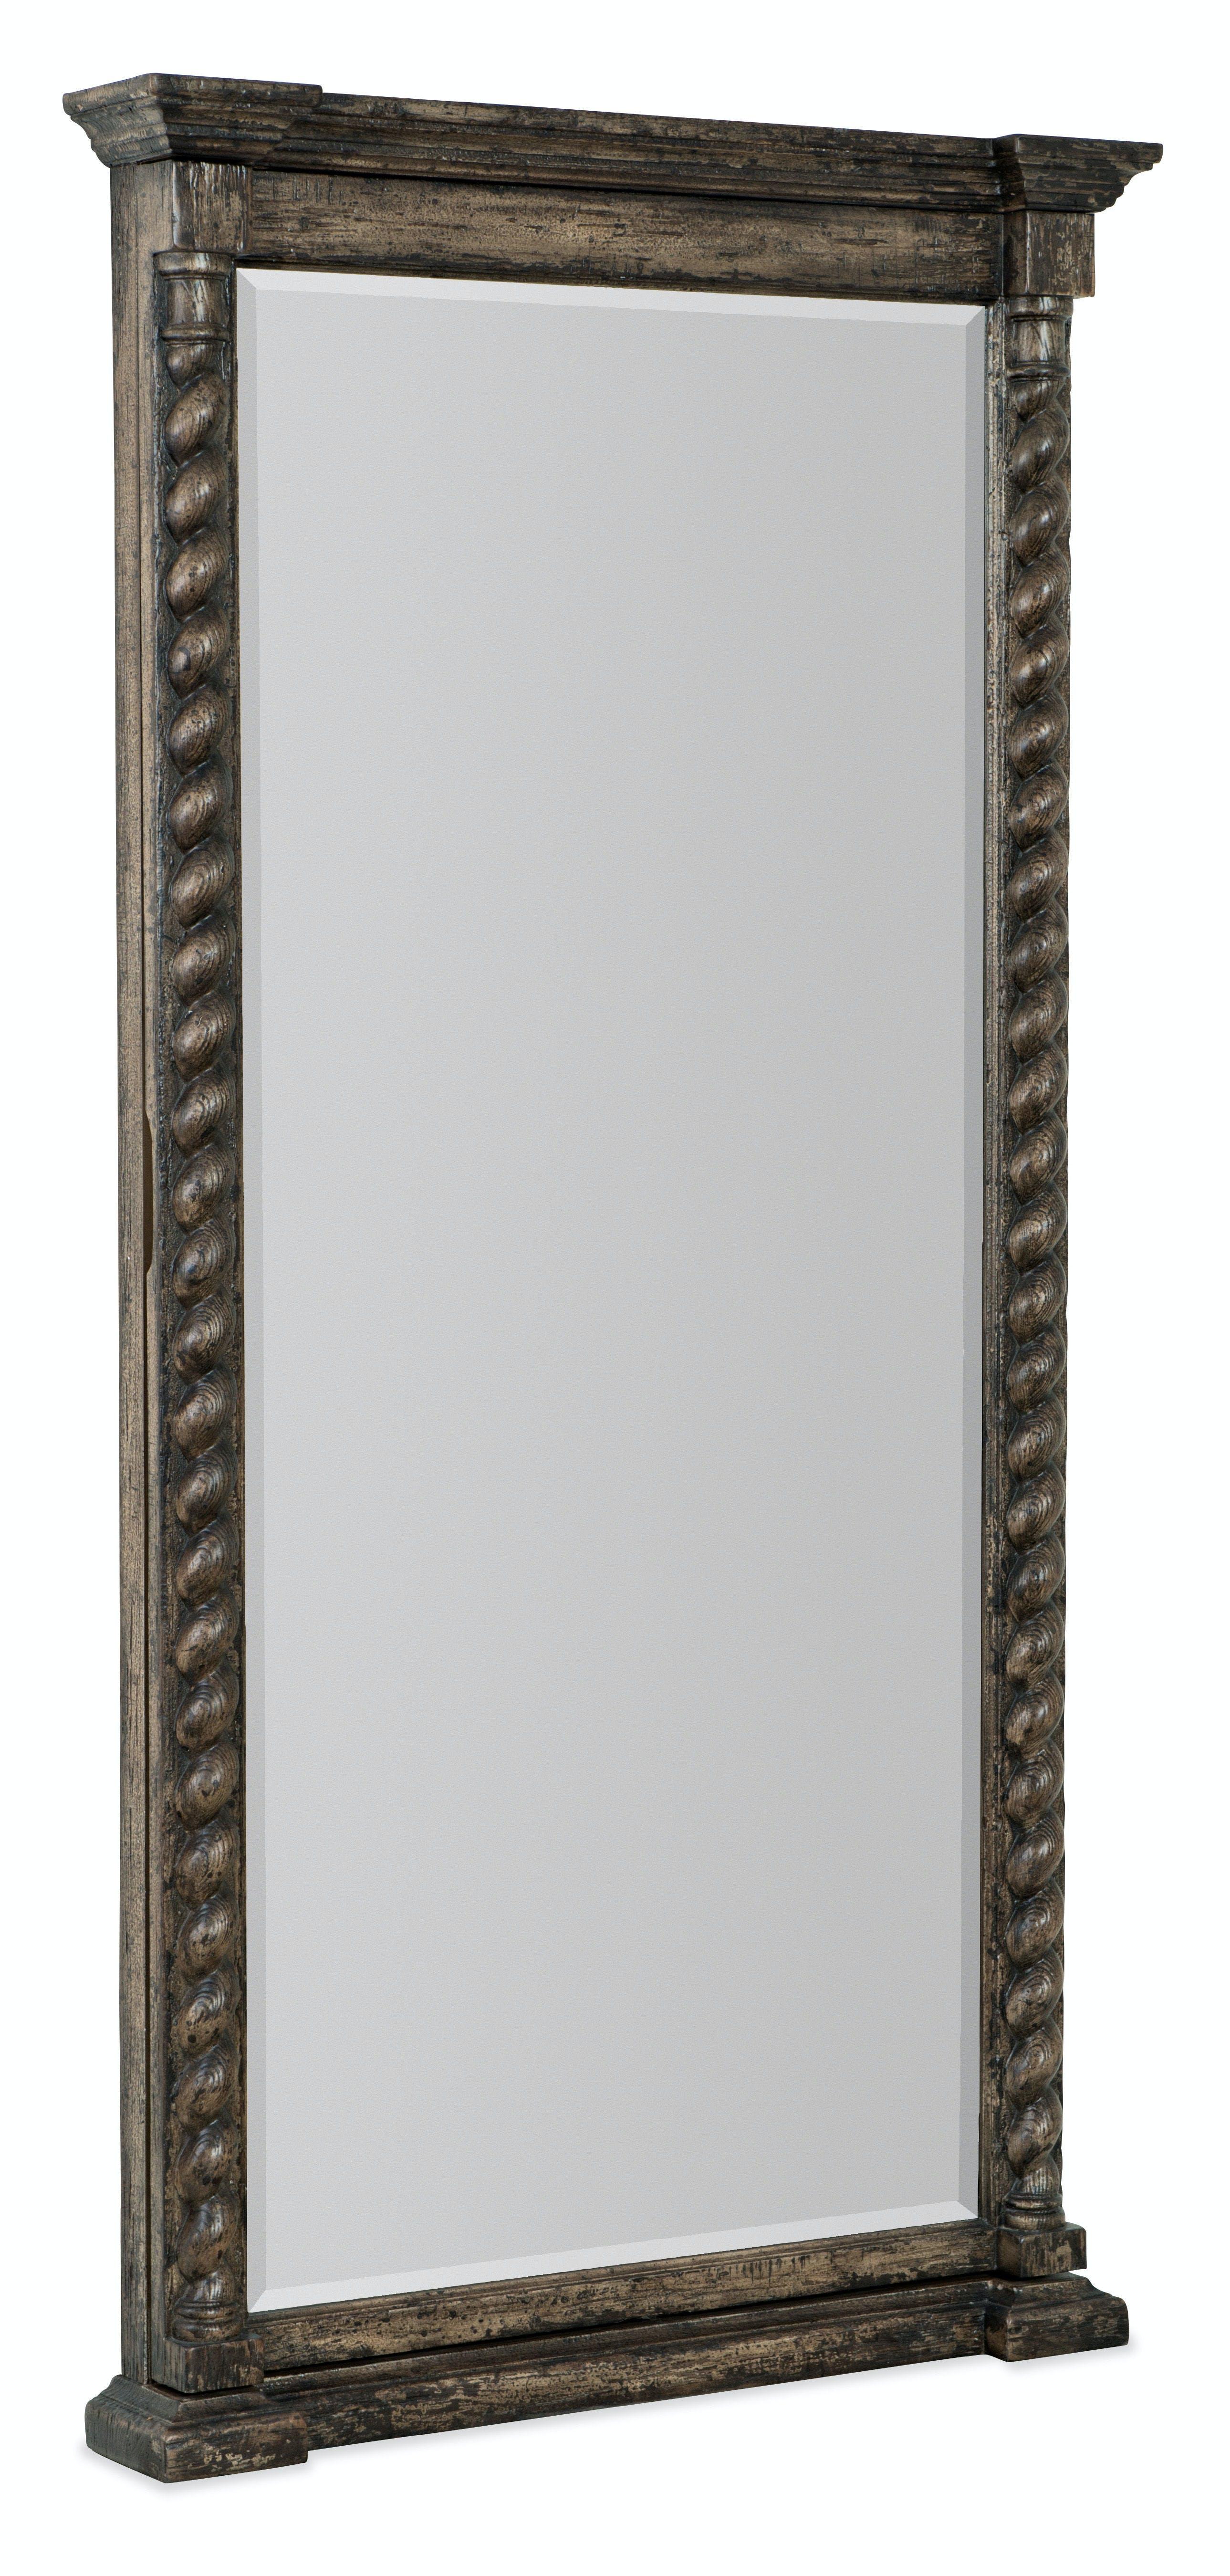 La Grange Vail Floor Mirror W Jewelry Storage Hs69605000487